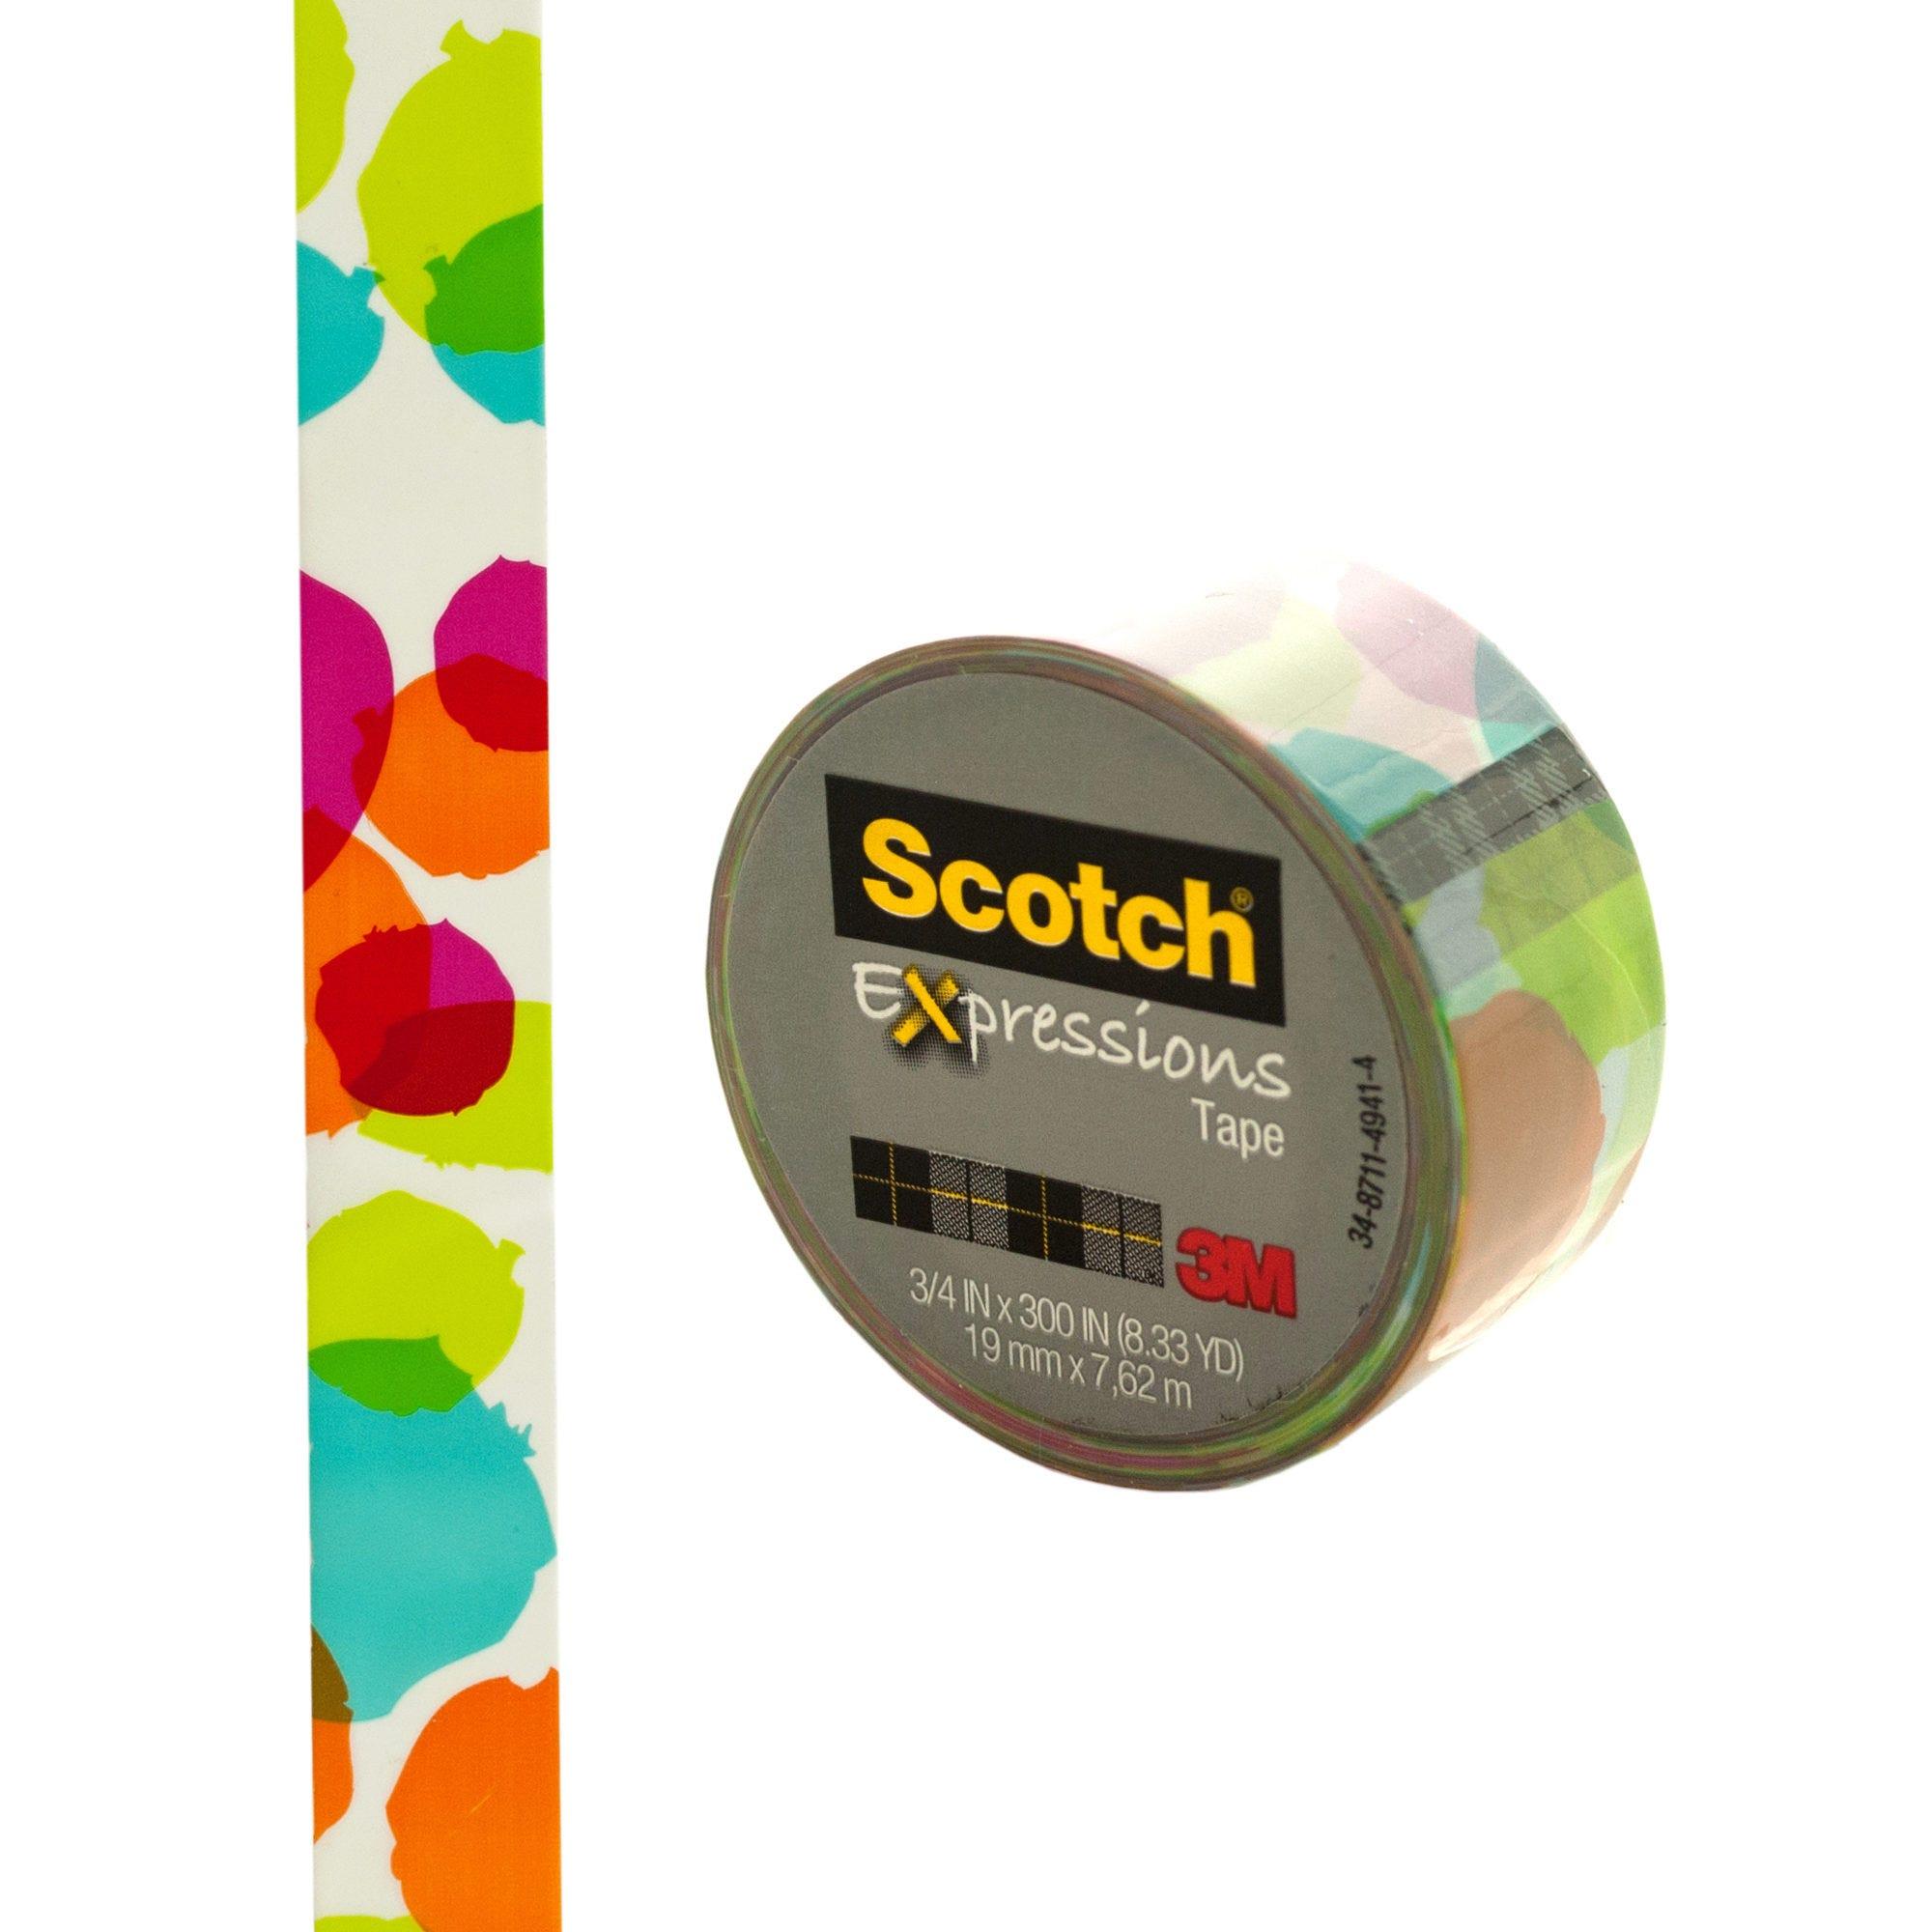 scotch packaging tape dispenser instructions